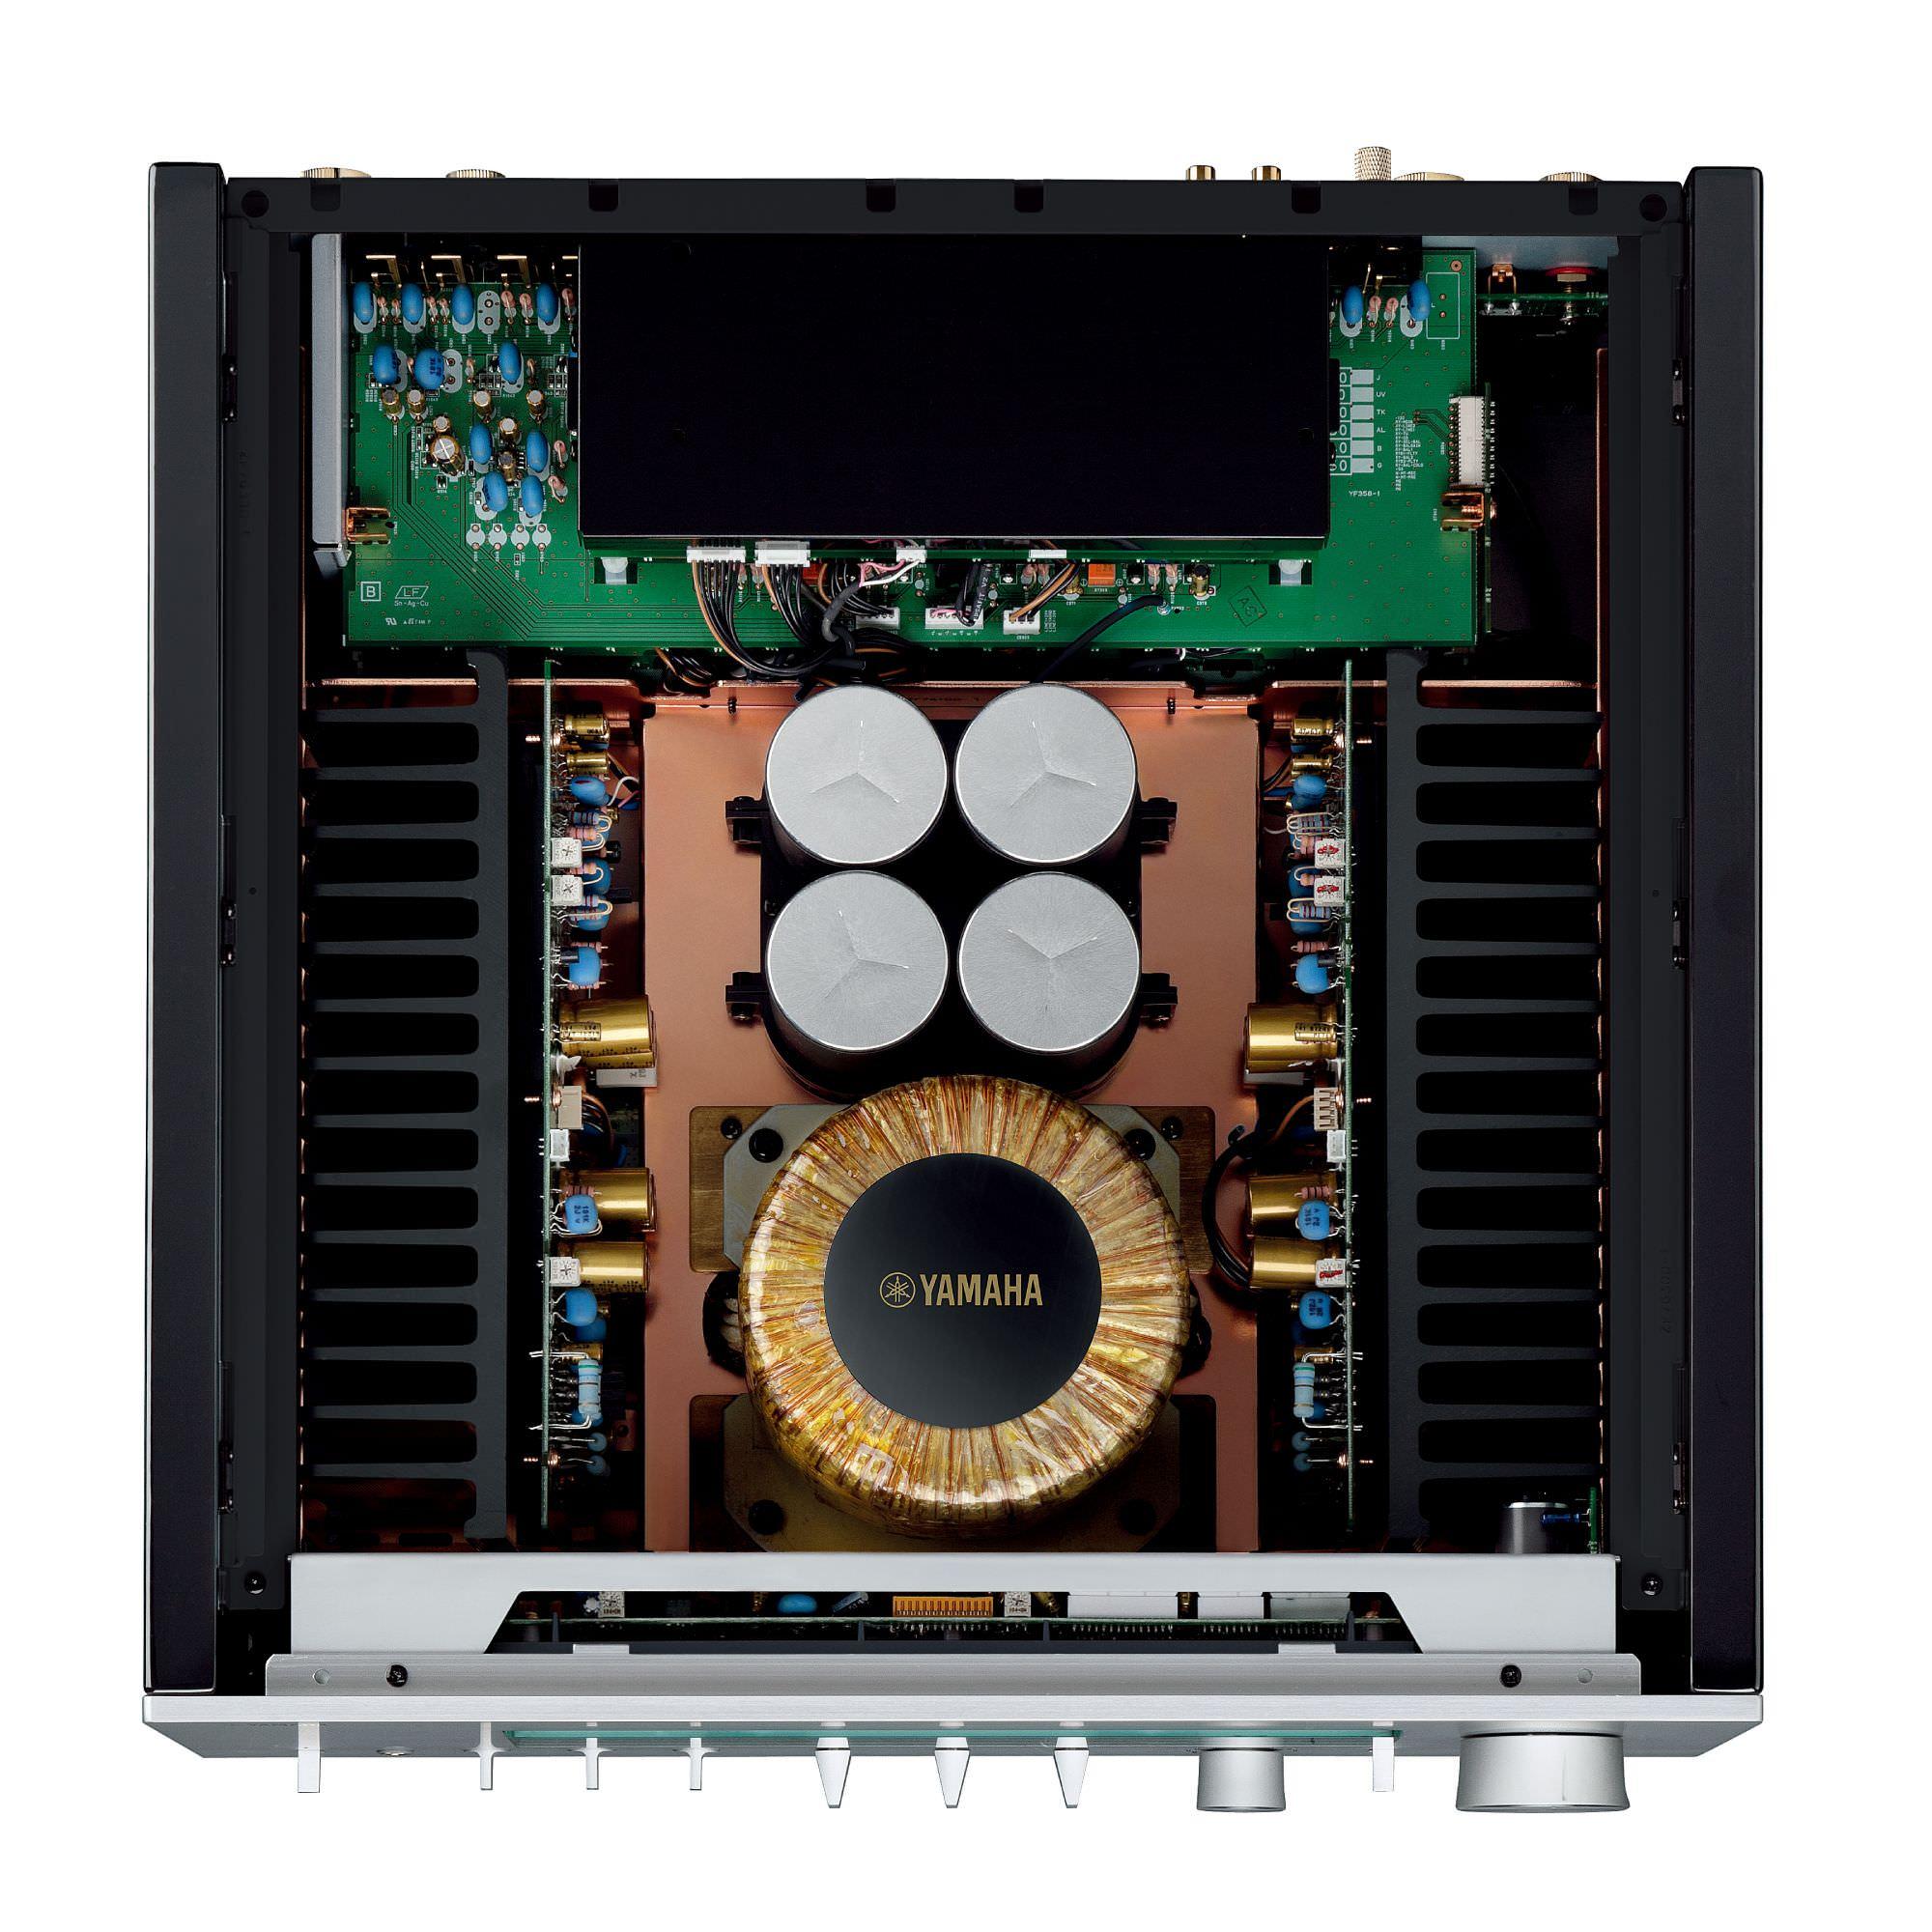 Yamaha A-S3200 Integrated Amplifier Interior